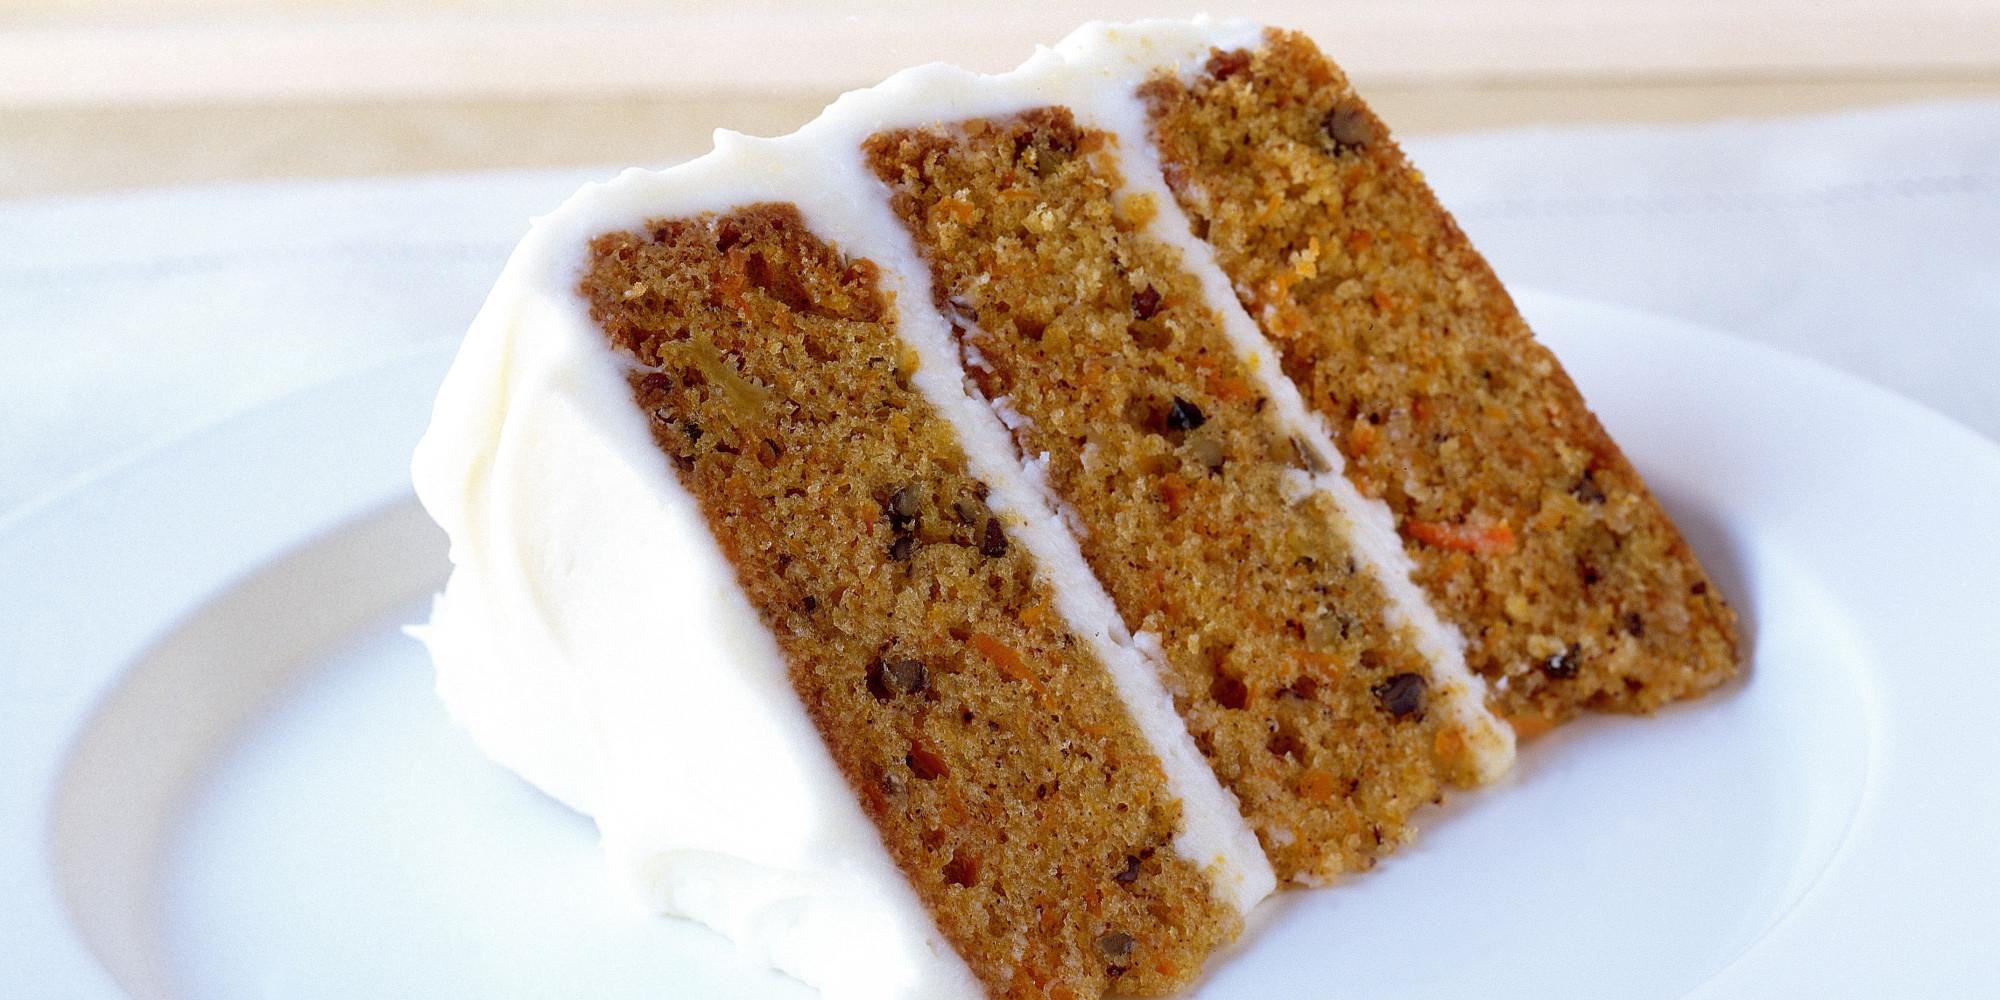 Smitten Kitchen Cake Smitten Kitchen Cake Recipes  Food Pasta Recipes